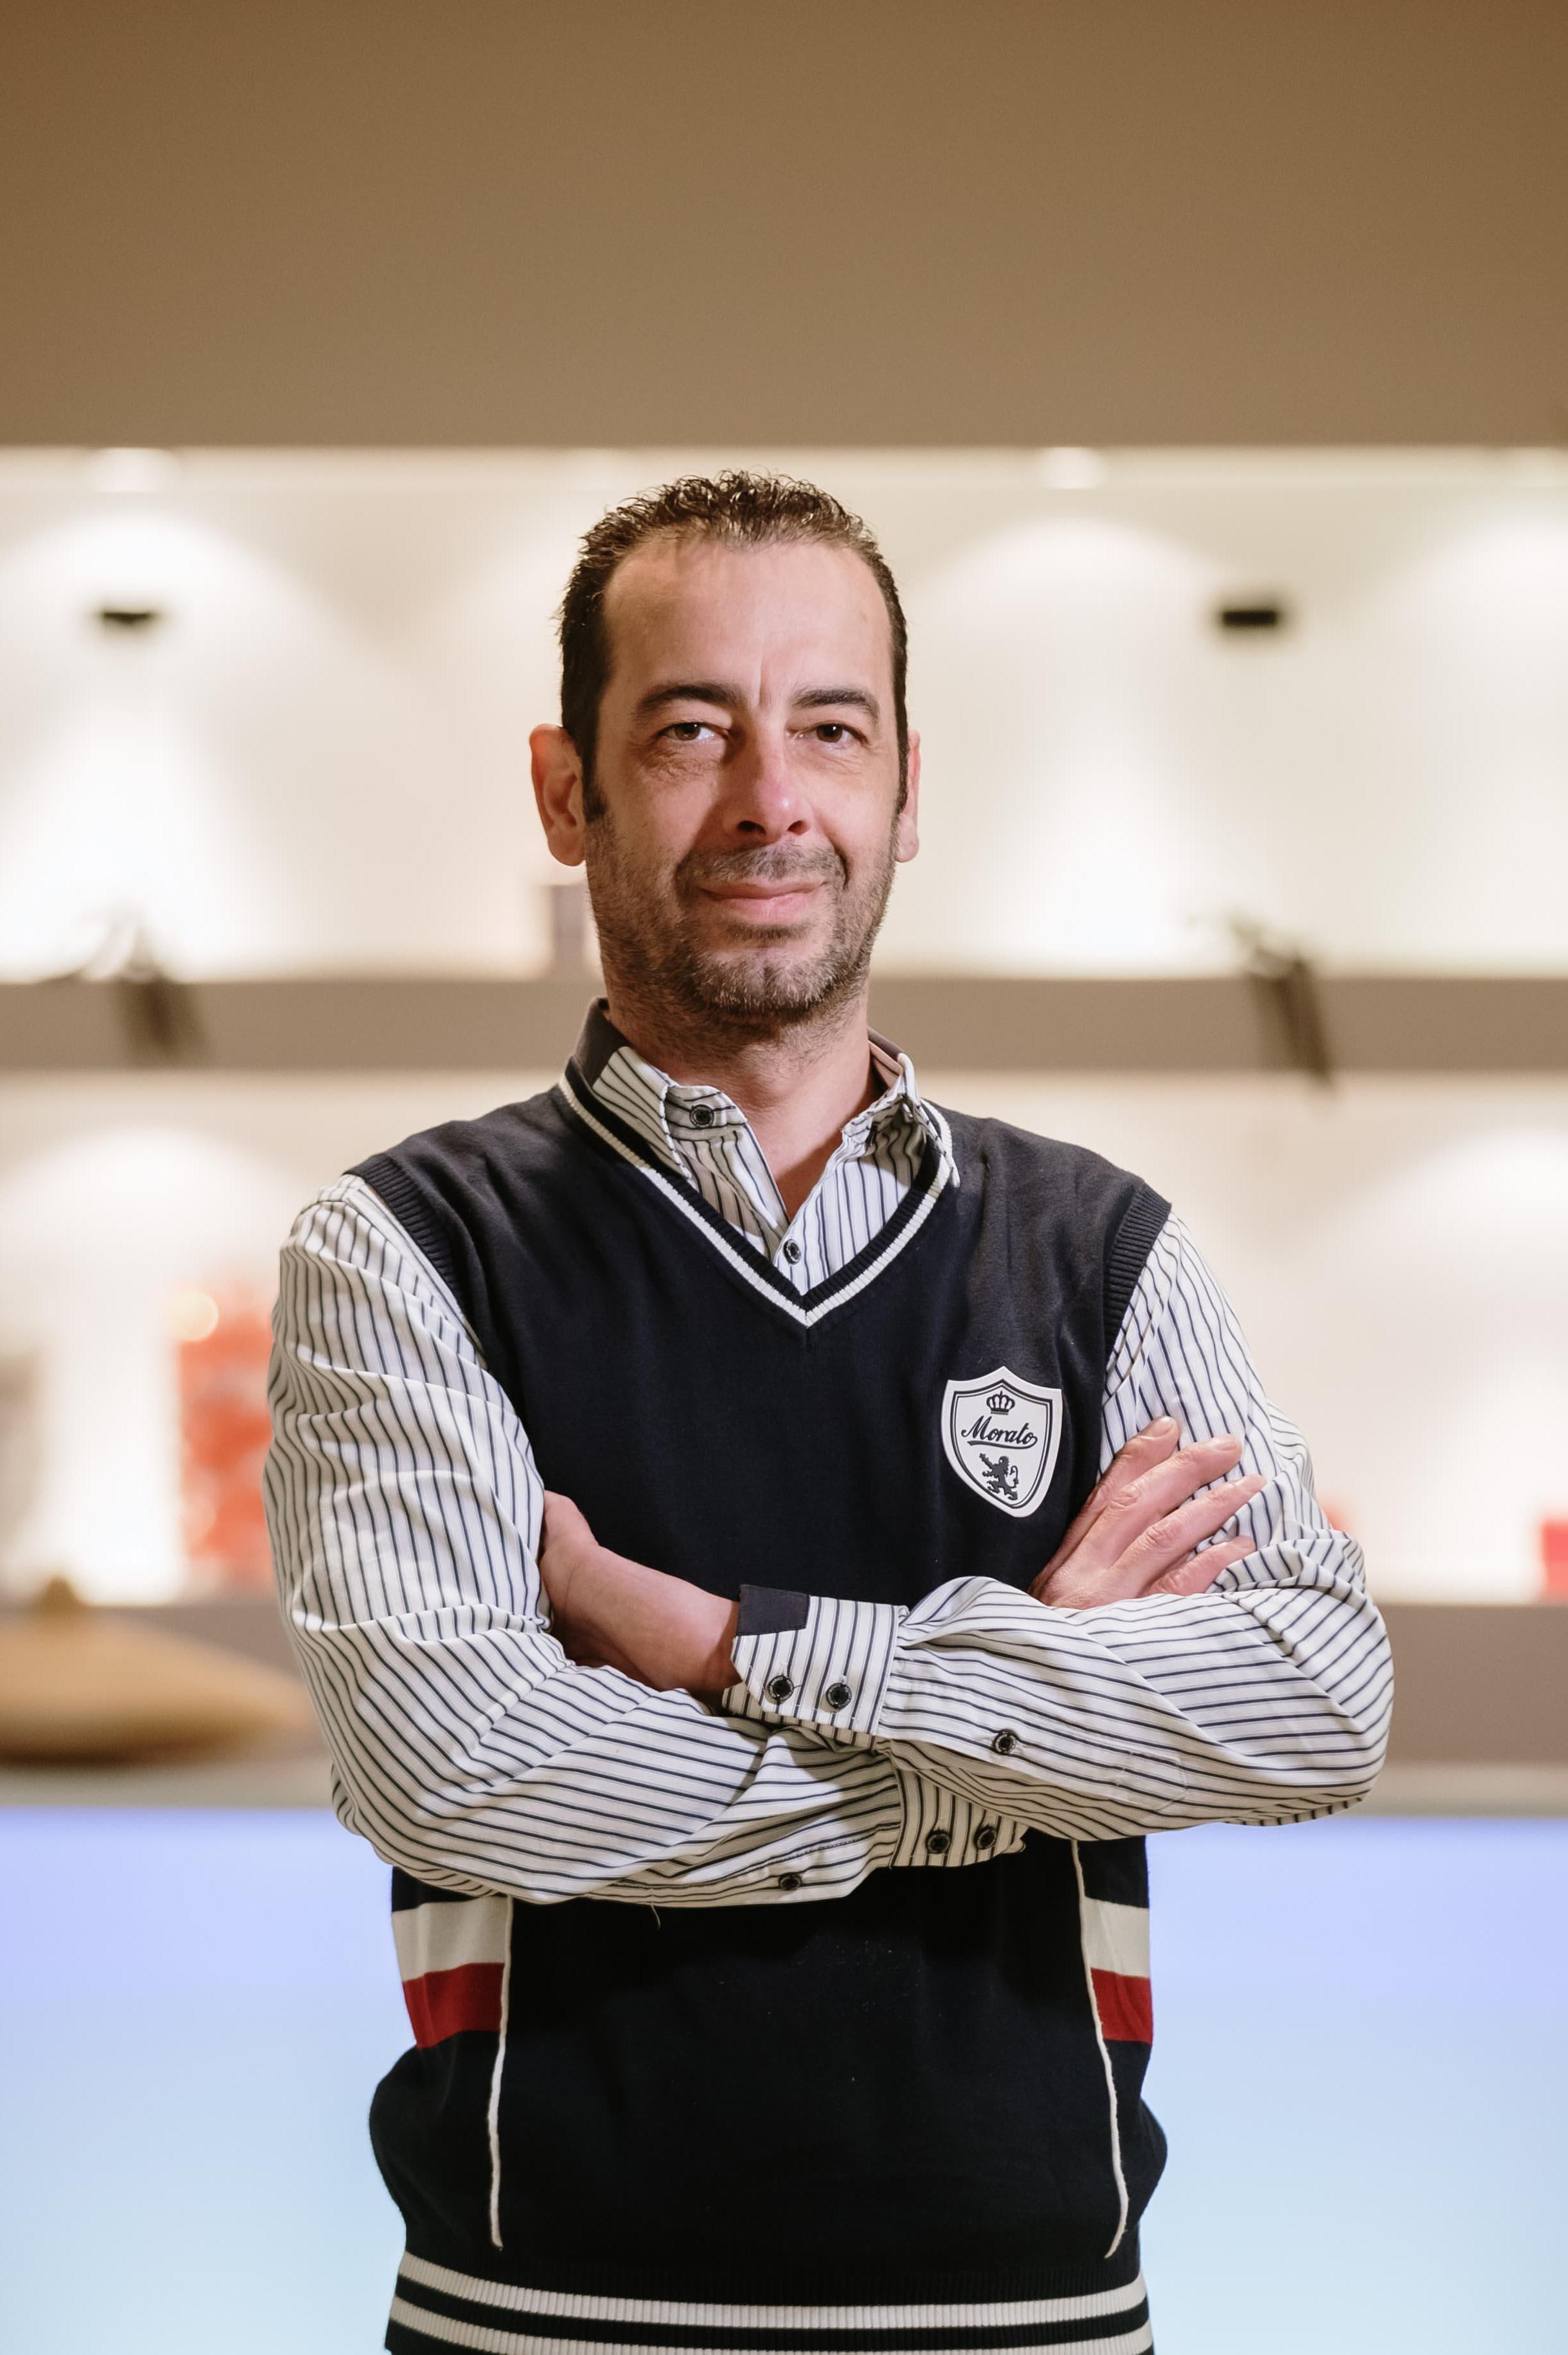 Riccardo Granili